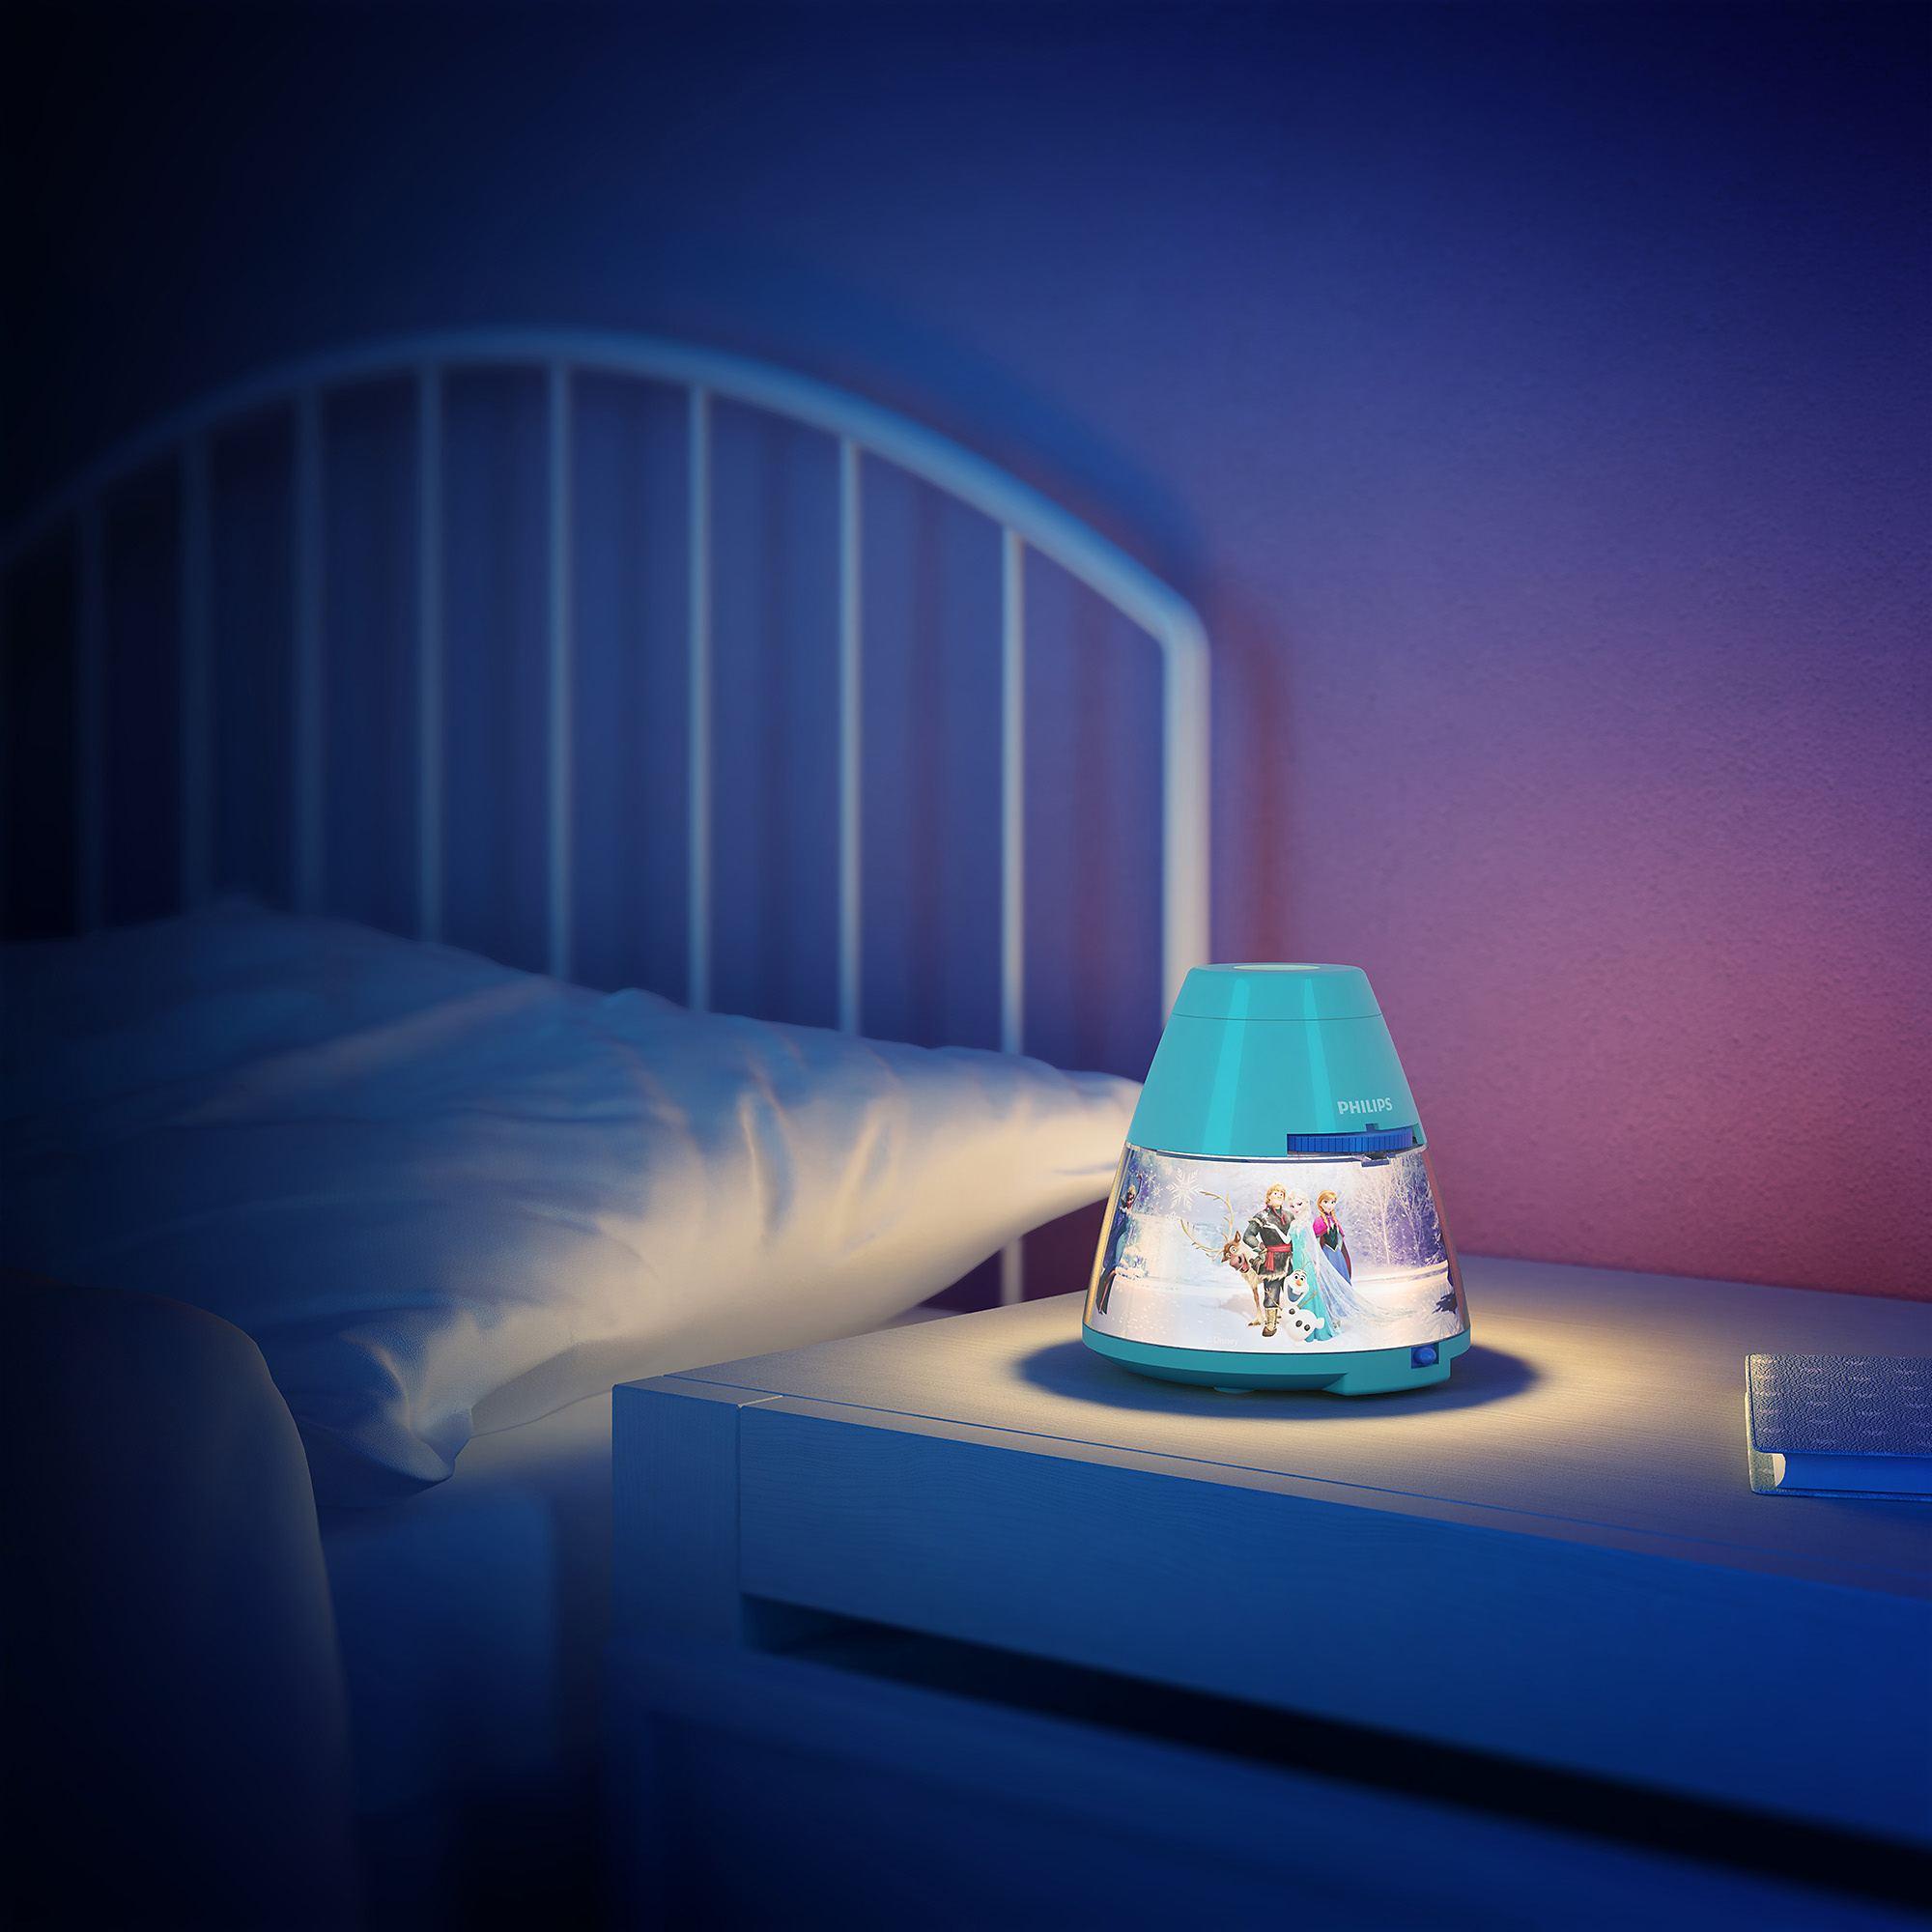 Philips Disney Frozen Children S Led Night Light Projector Portable Battery Liminaires